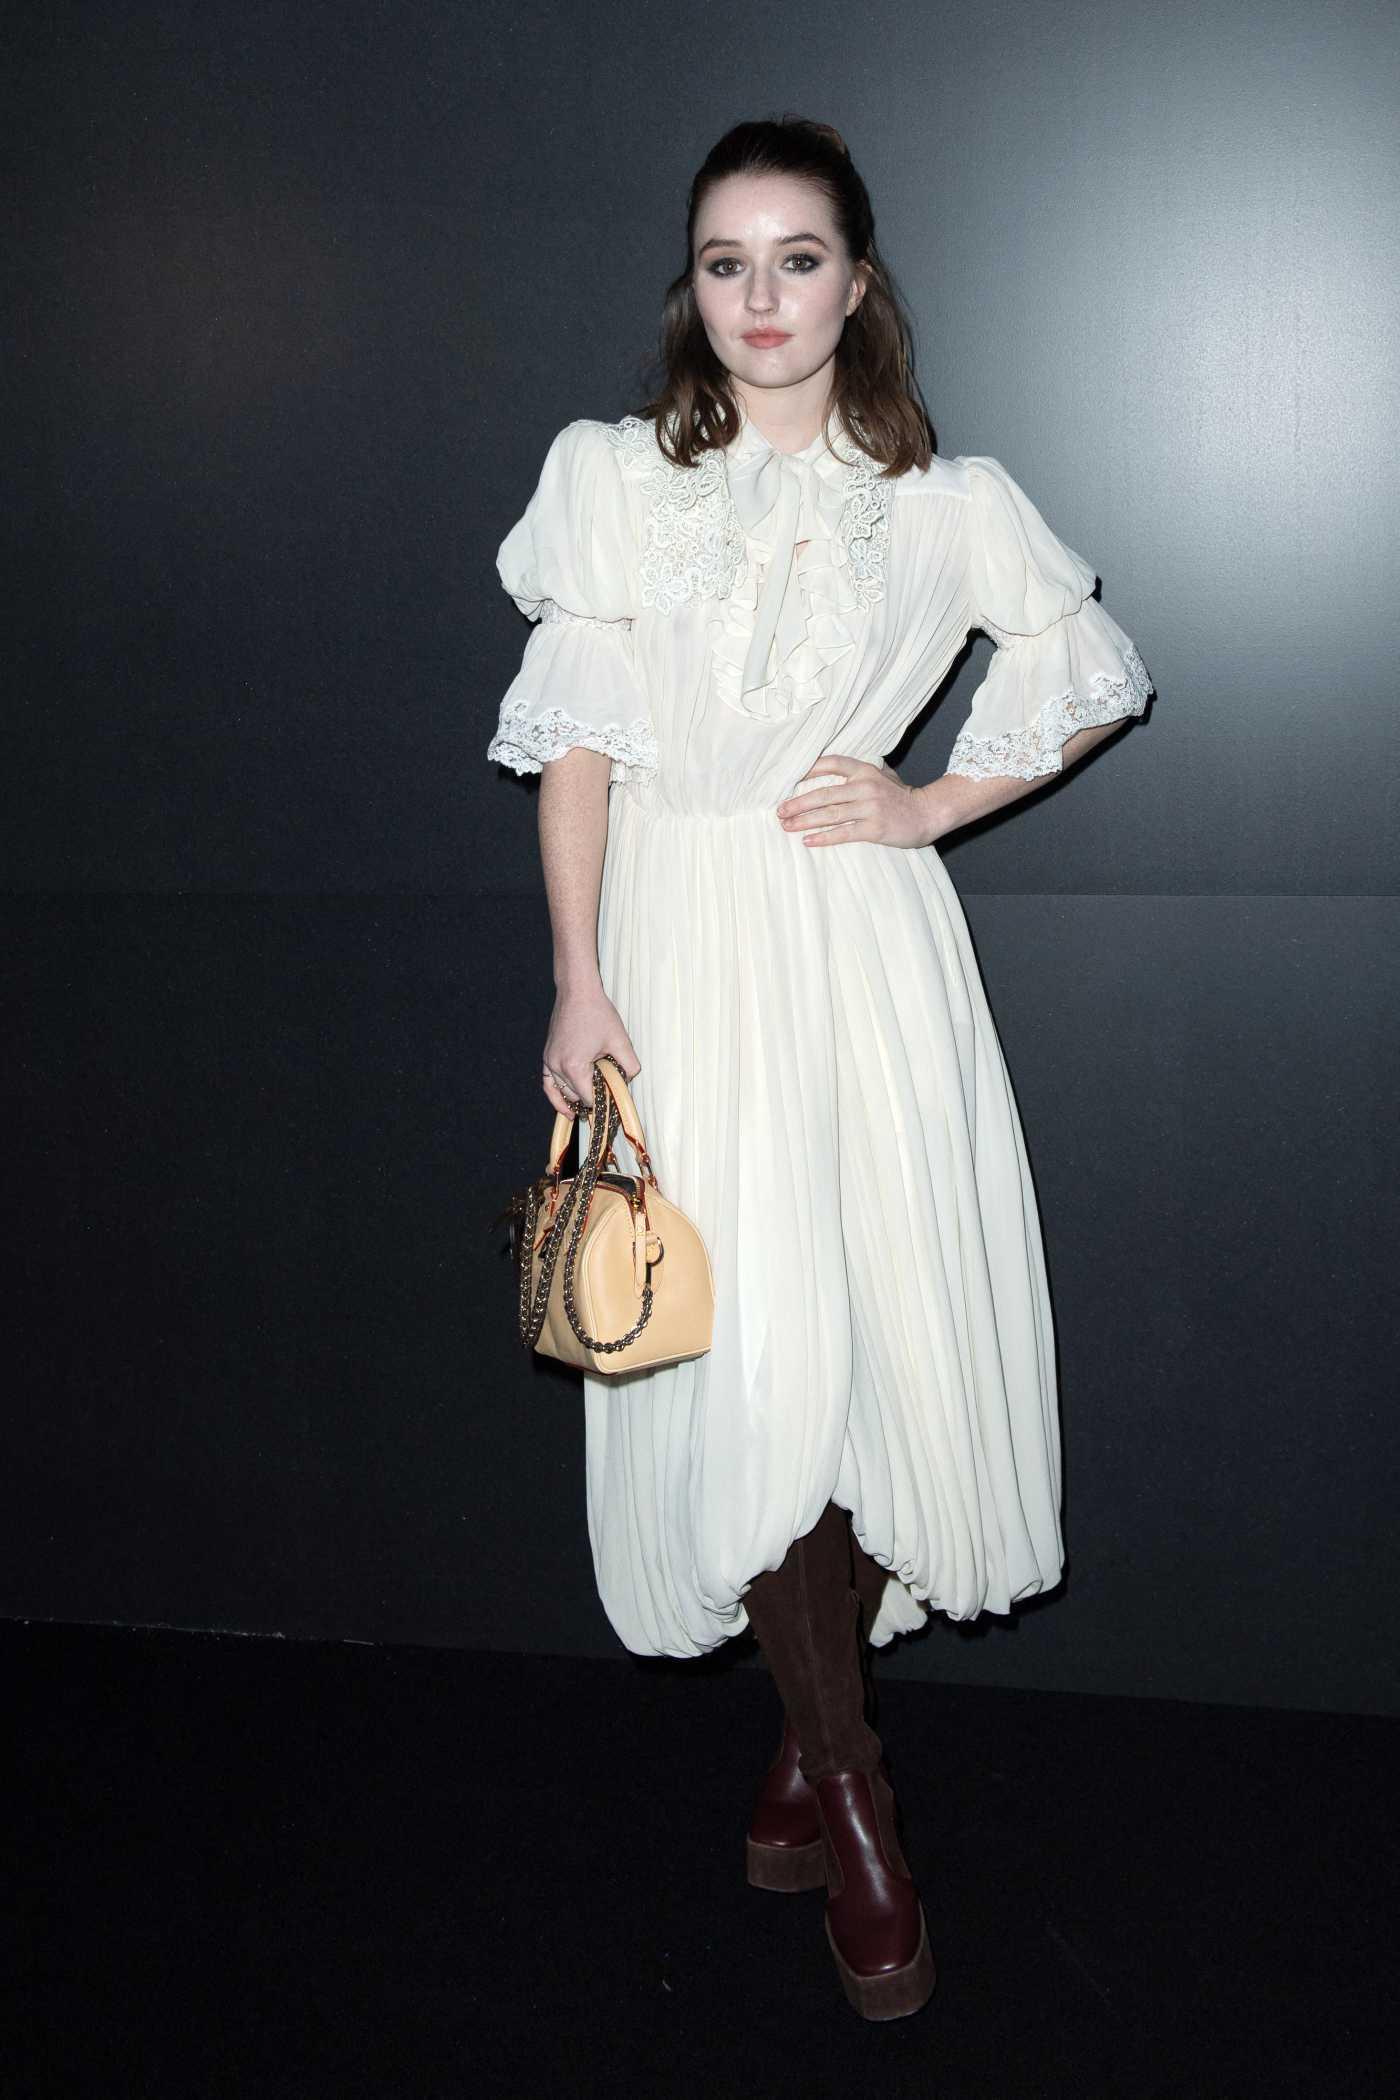 Kaitlyn Dever Attends 2020 Louis Vuitton Fashion Show in Paris 03/03/2020